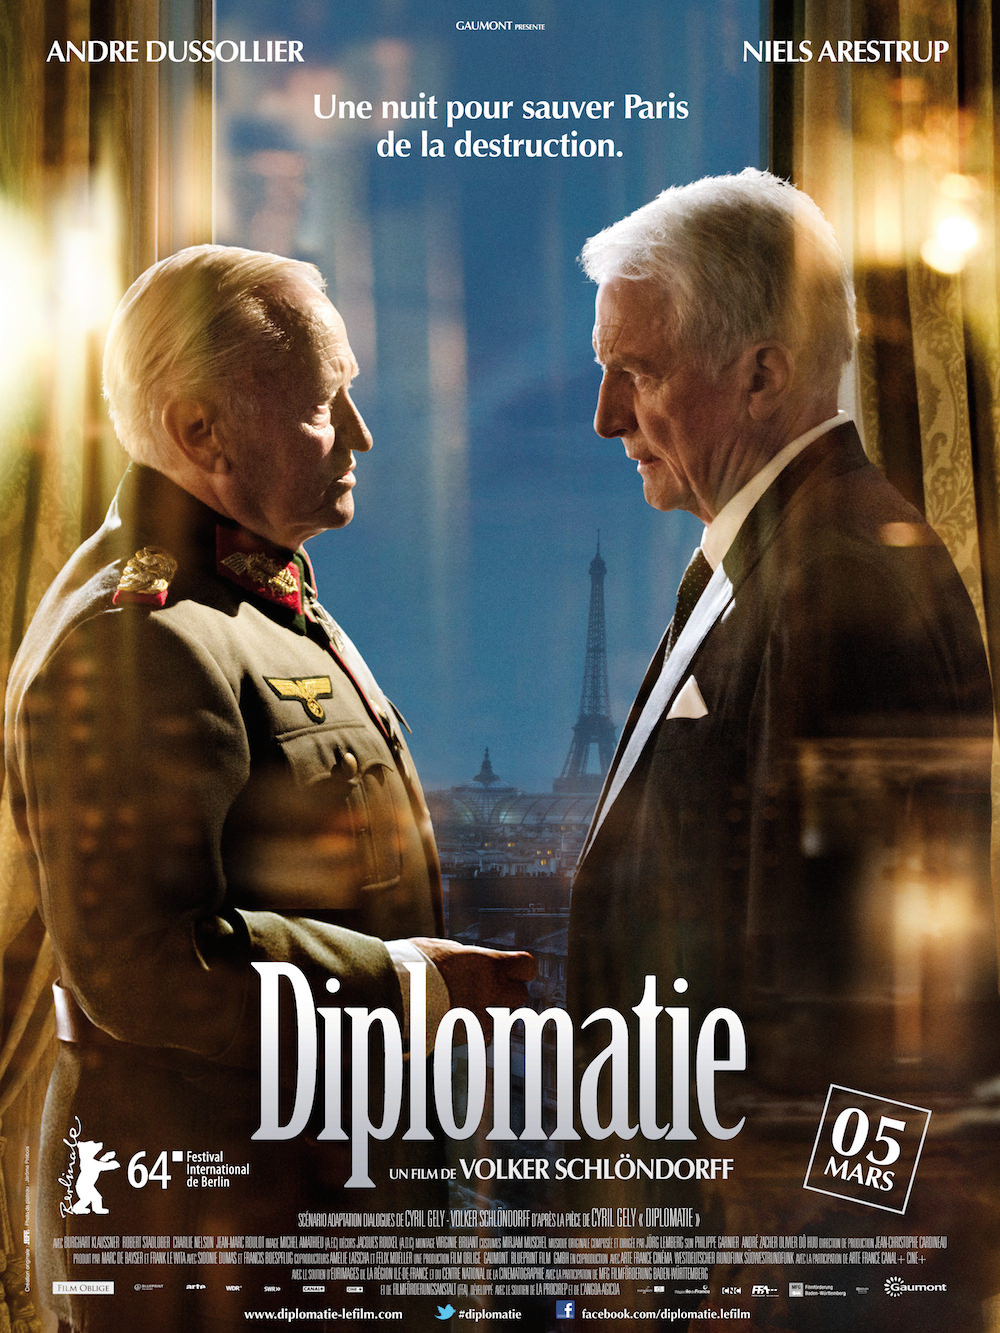 Diplomatie schlondorff